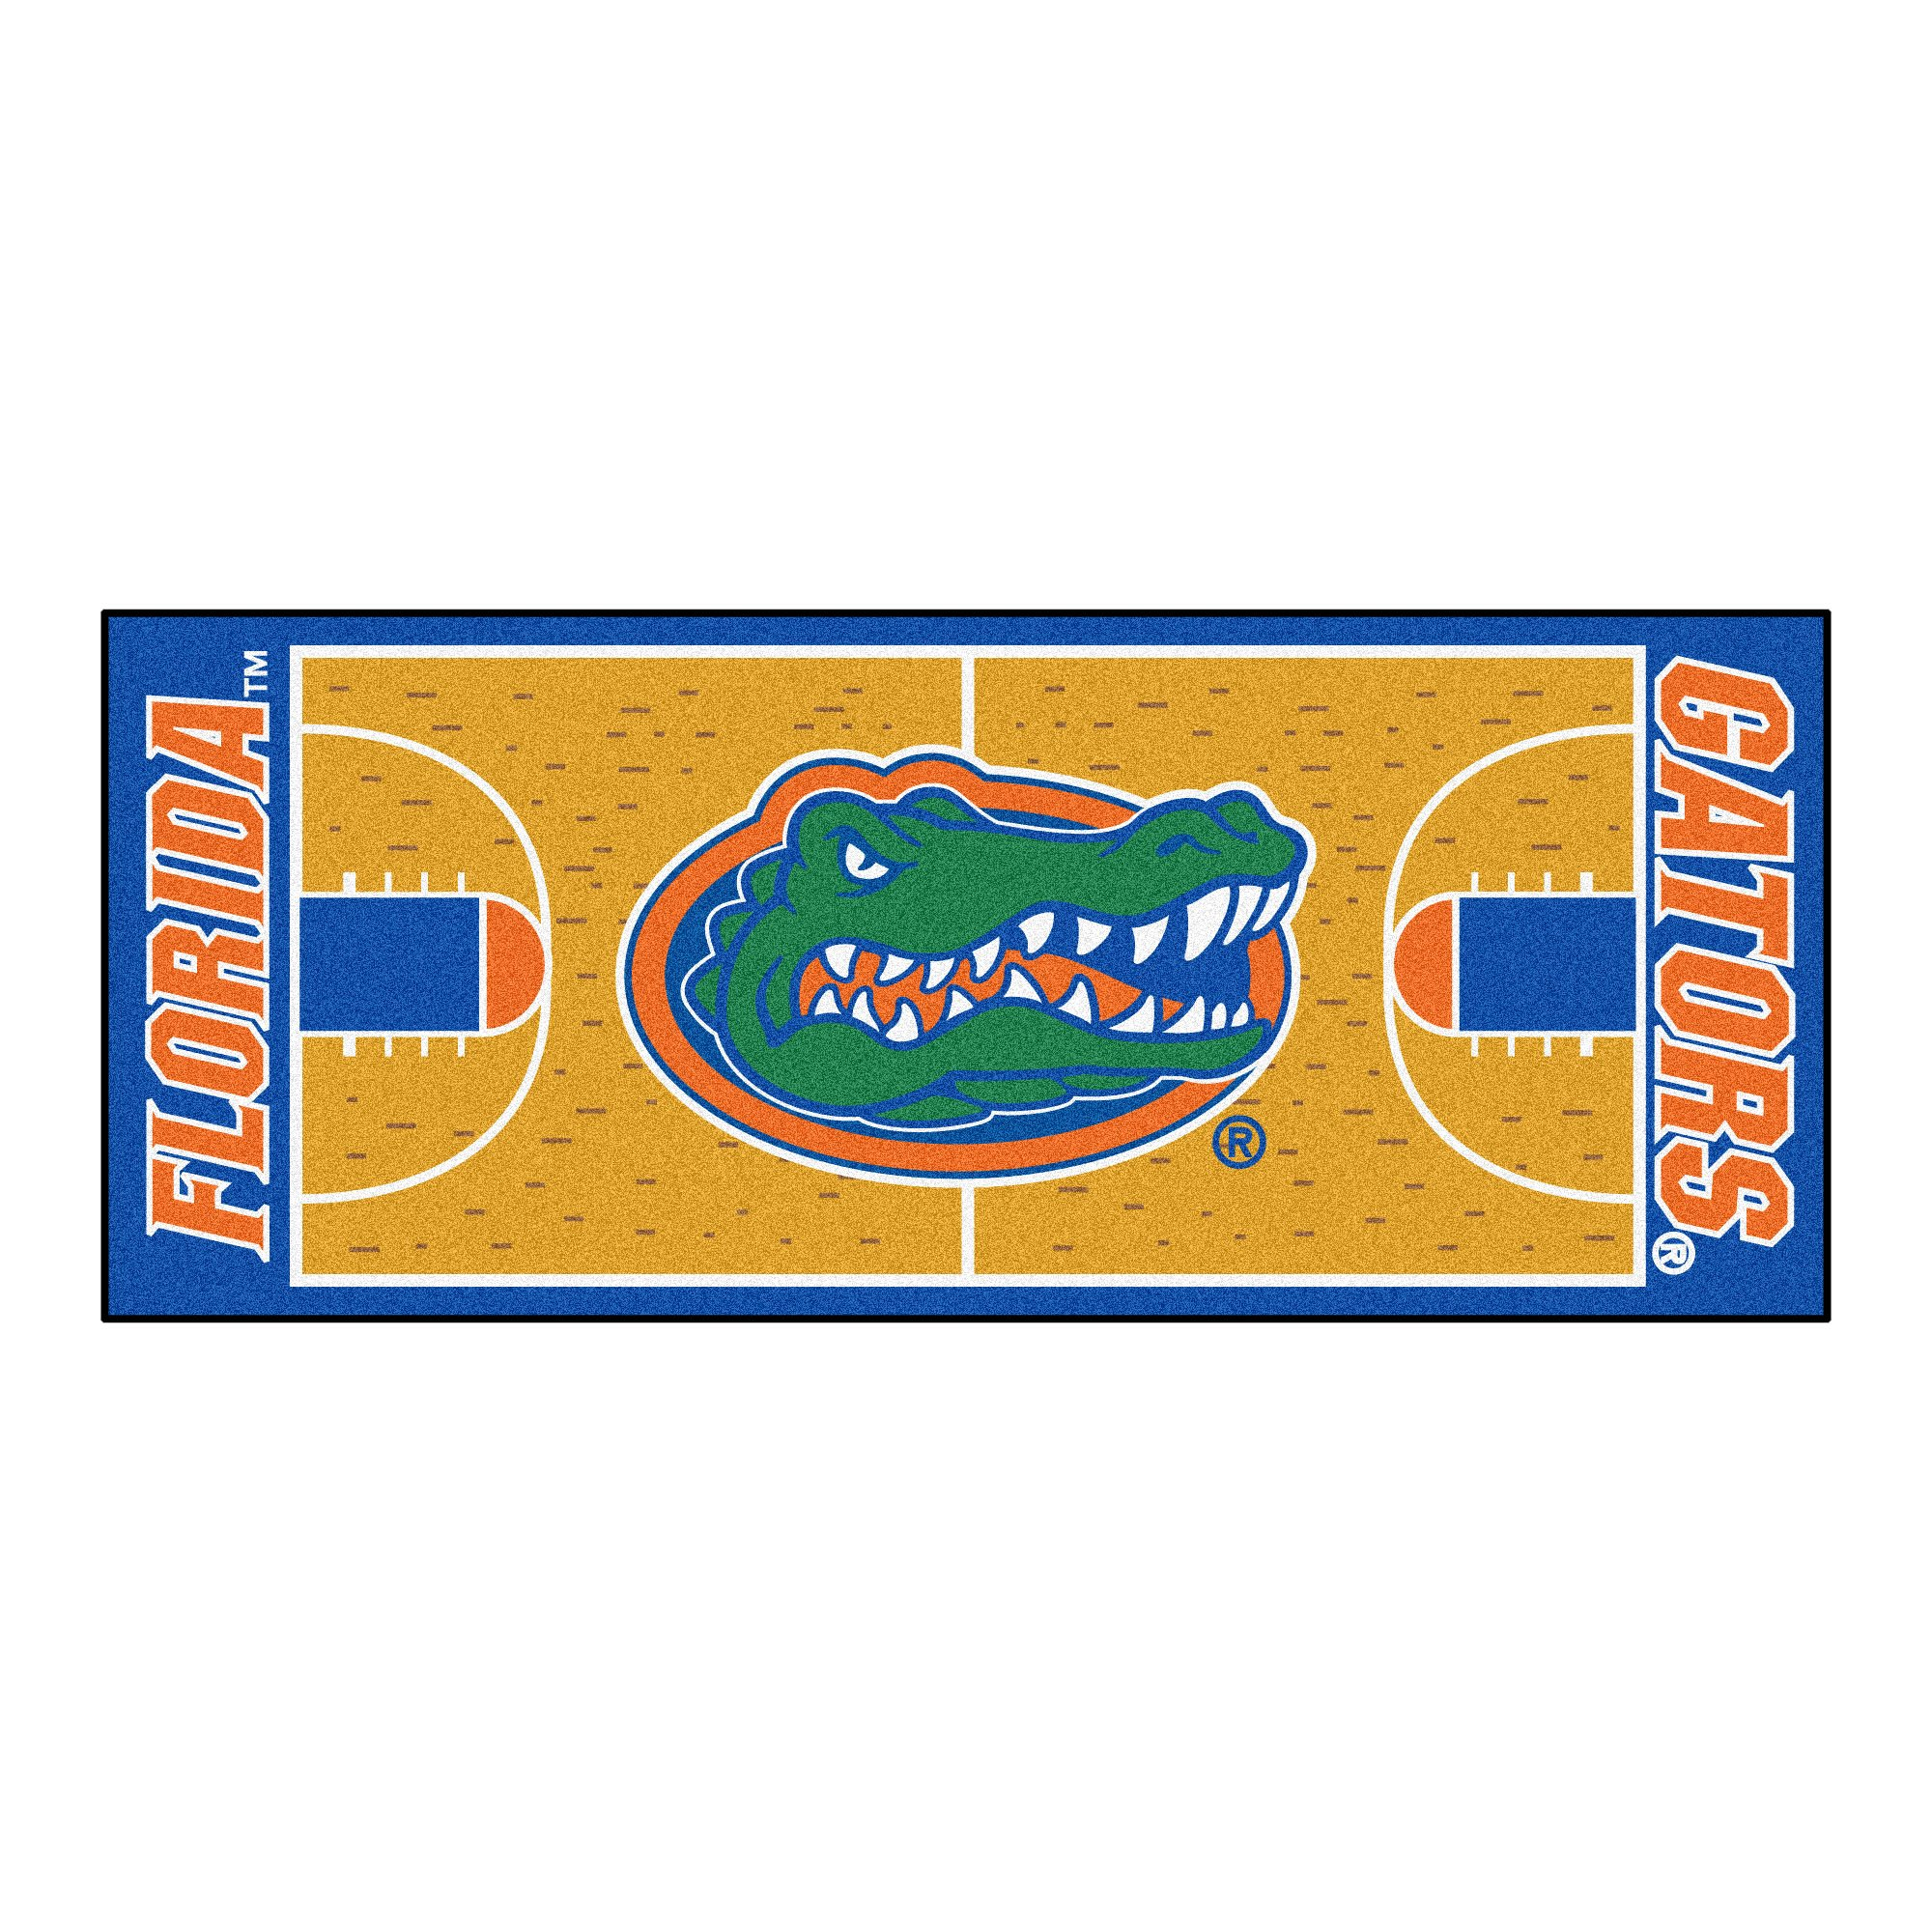 NCAA University of Florida Gators NCAA Basketball Non-Skid Mat Area Rug Runner